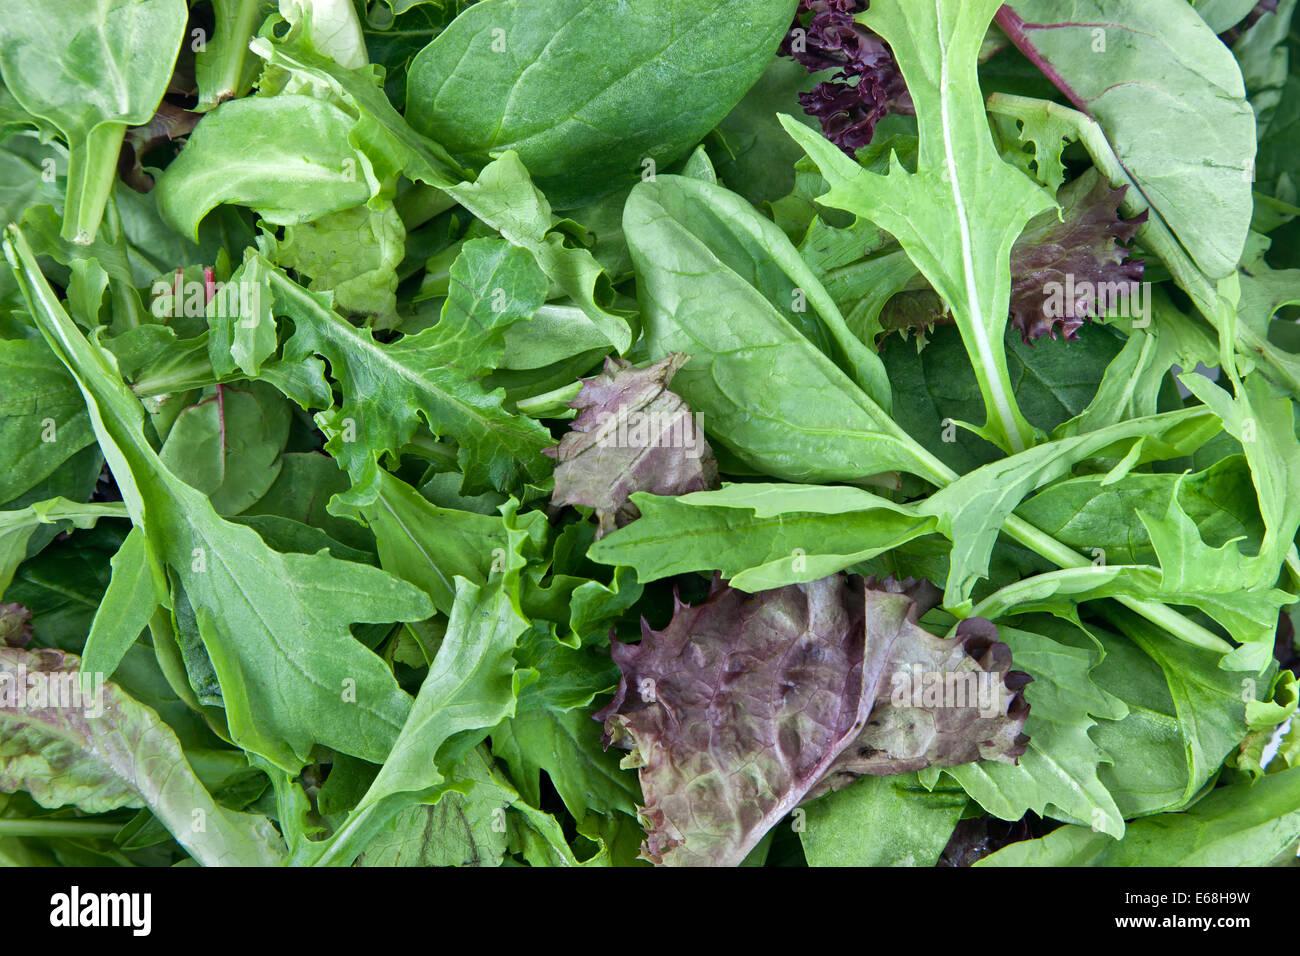 Organic 'baby lettuce' 'spring' salad mix. - Stock Image